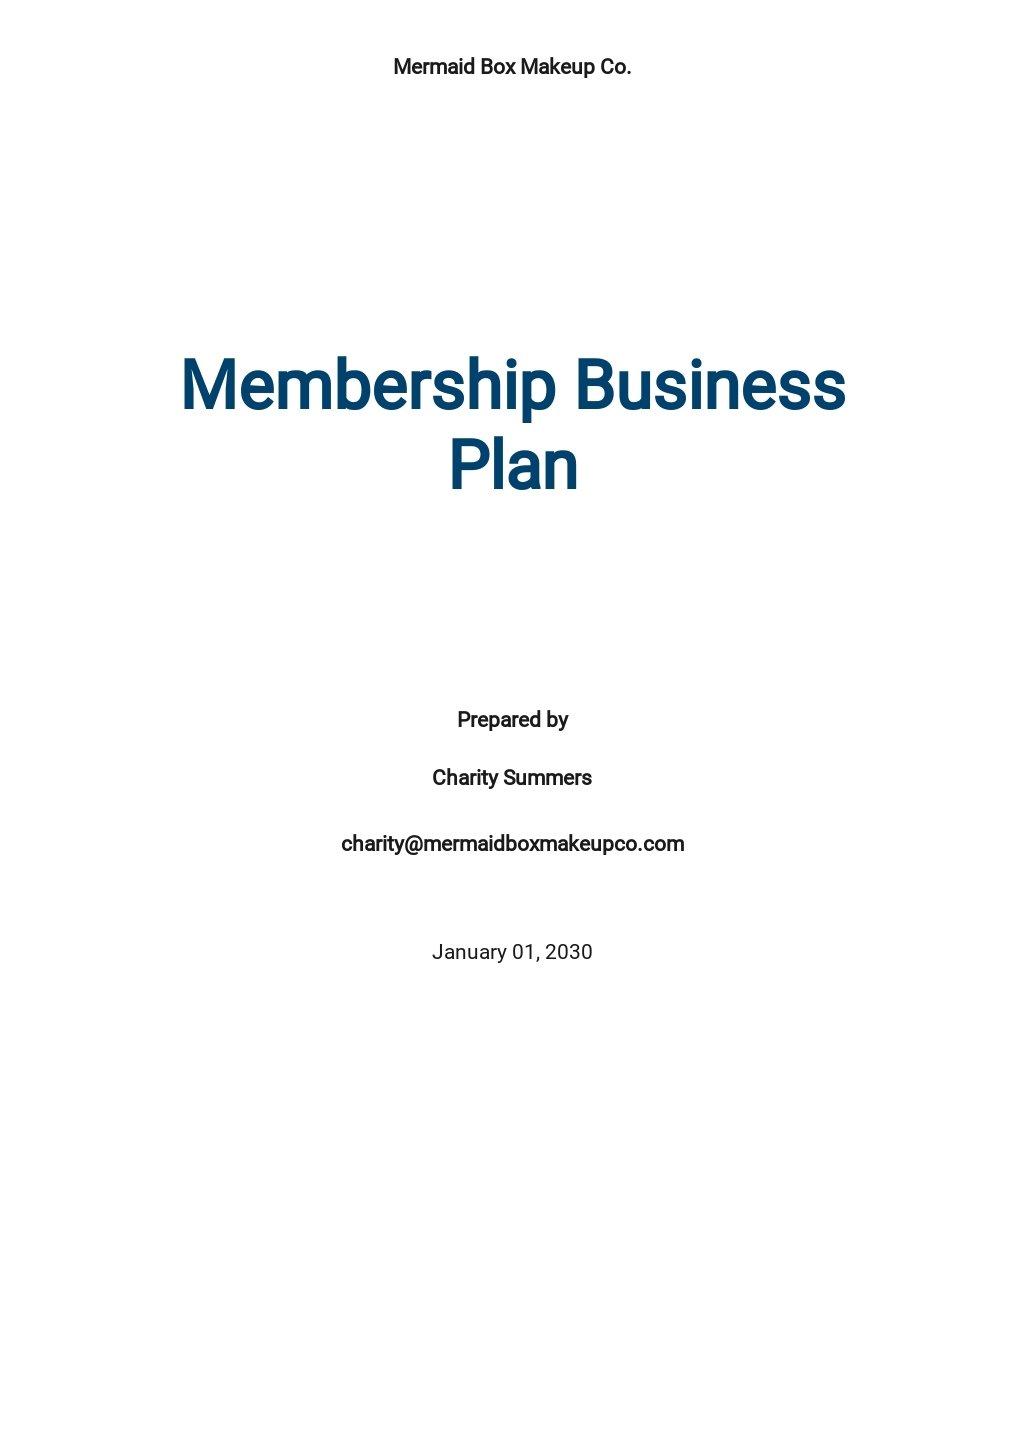 Membership Business Plan Template